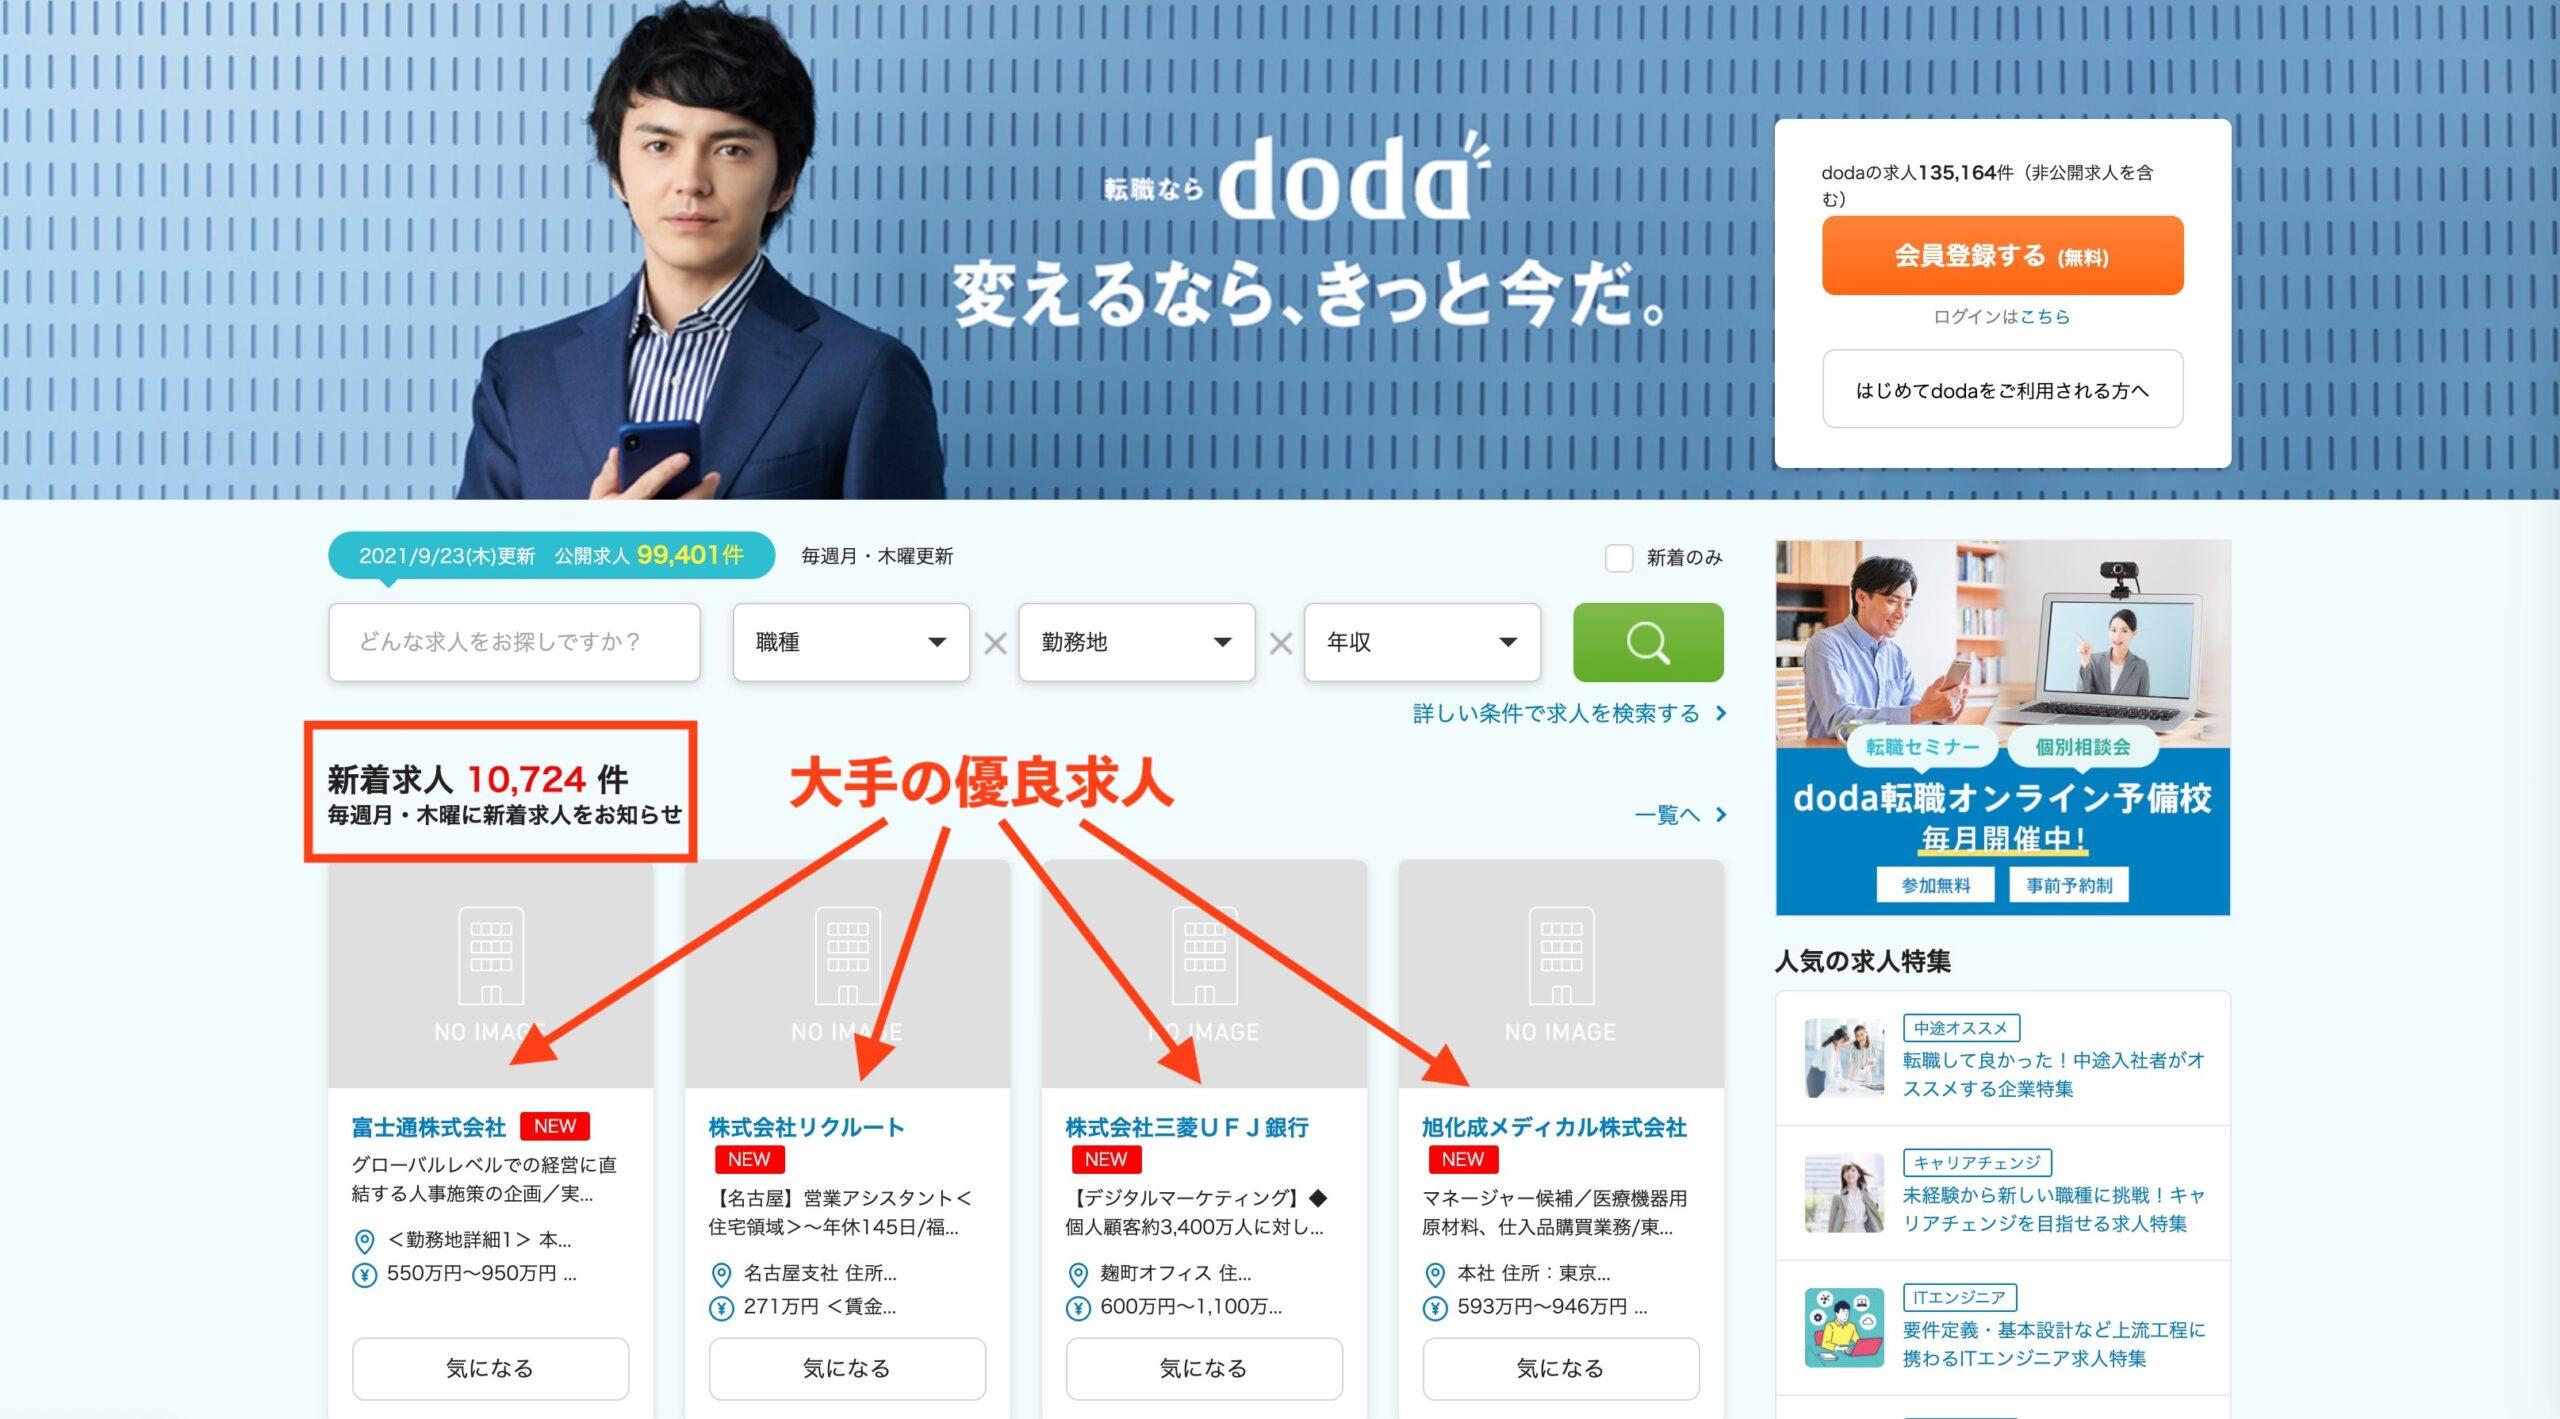 dodaの新着求人数